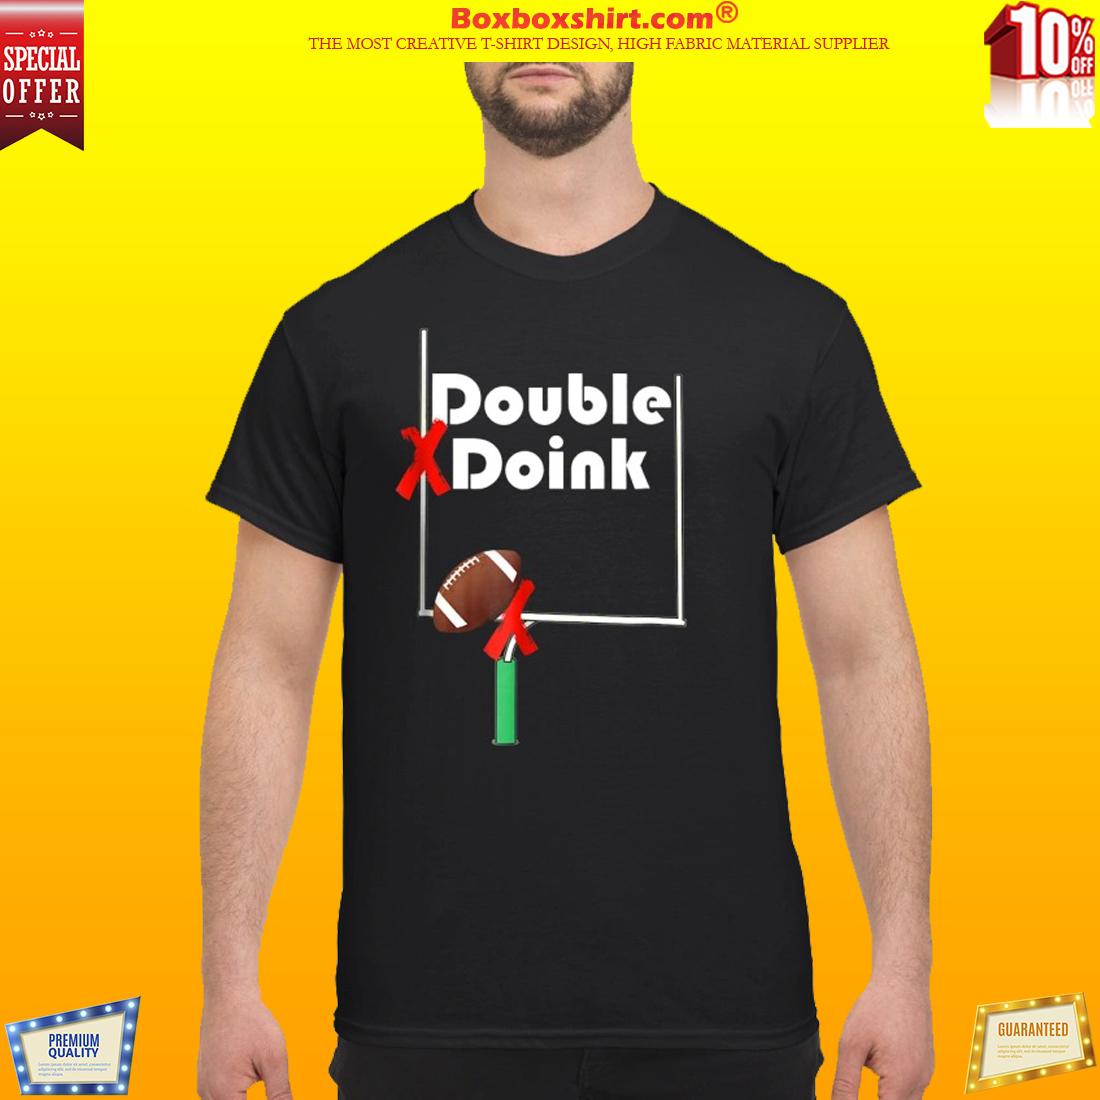 Double Doink Football shirt